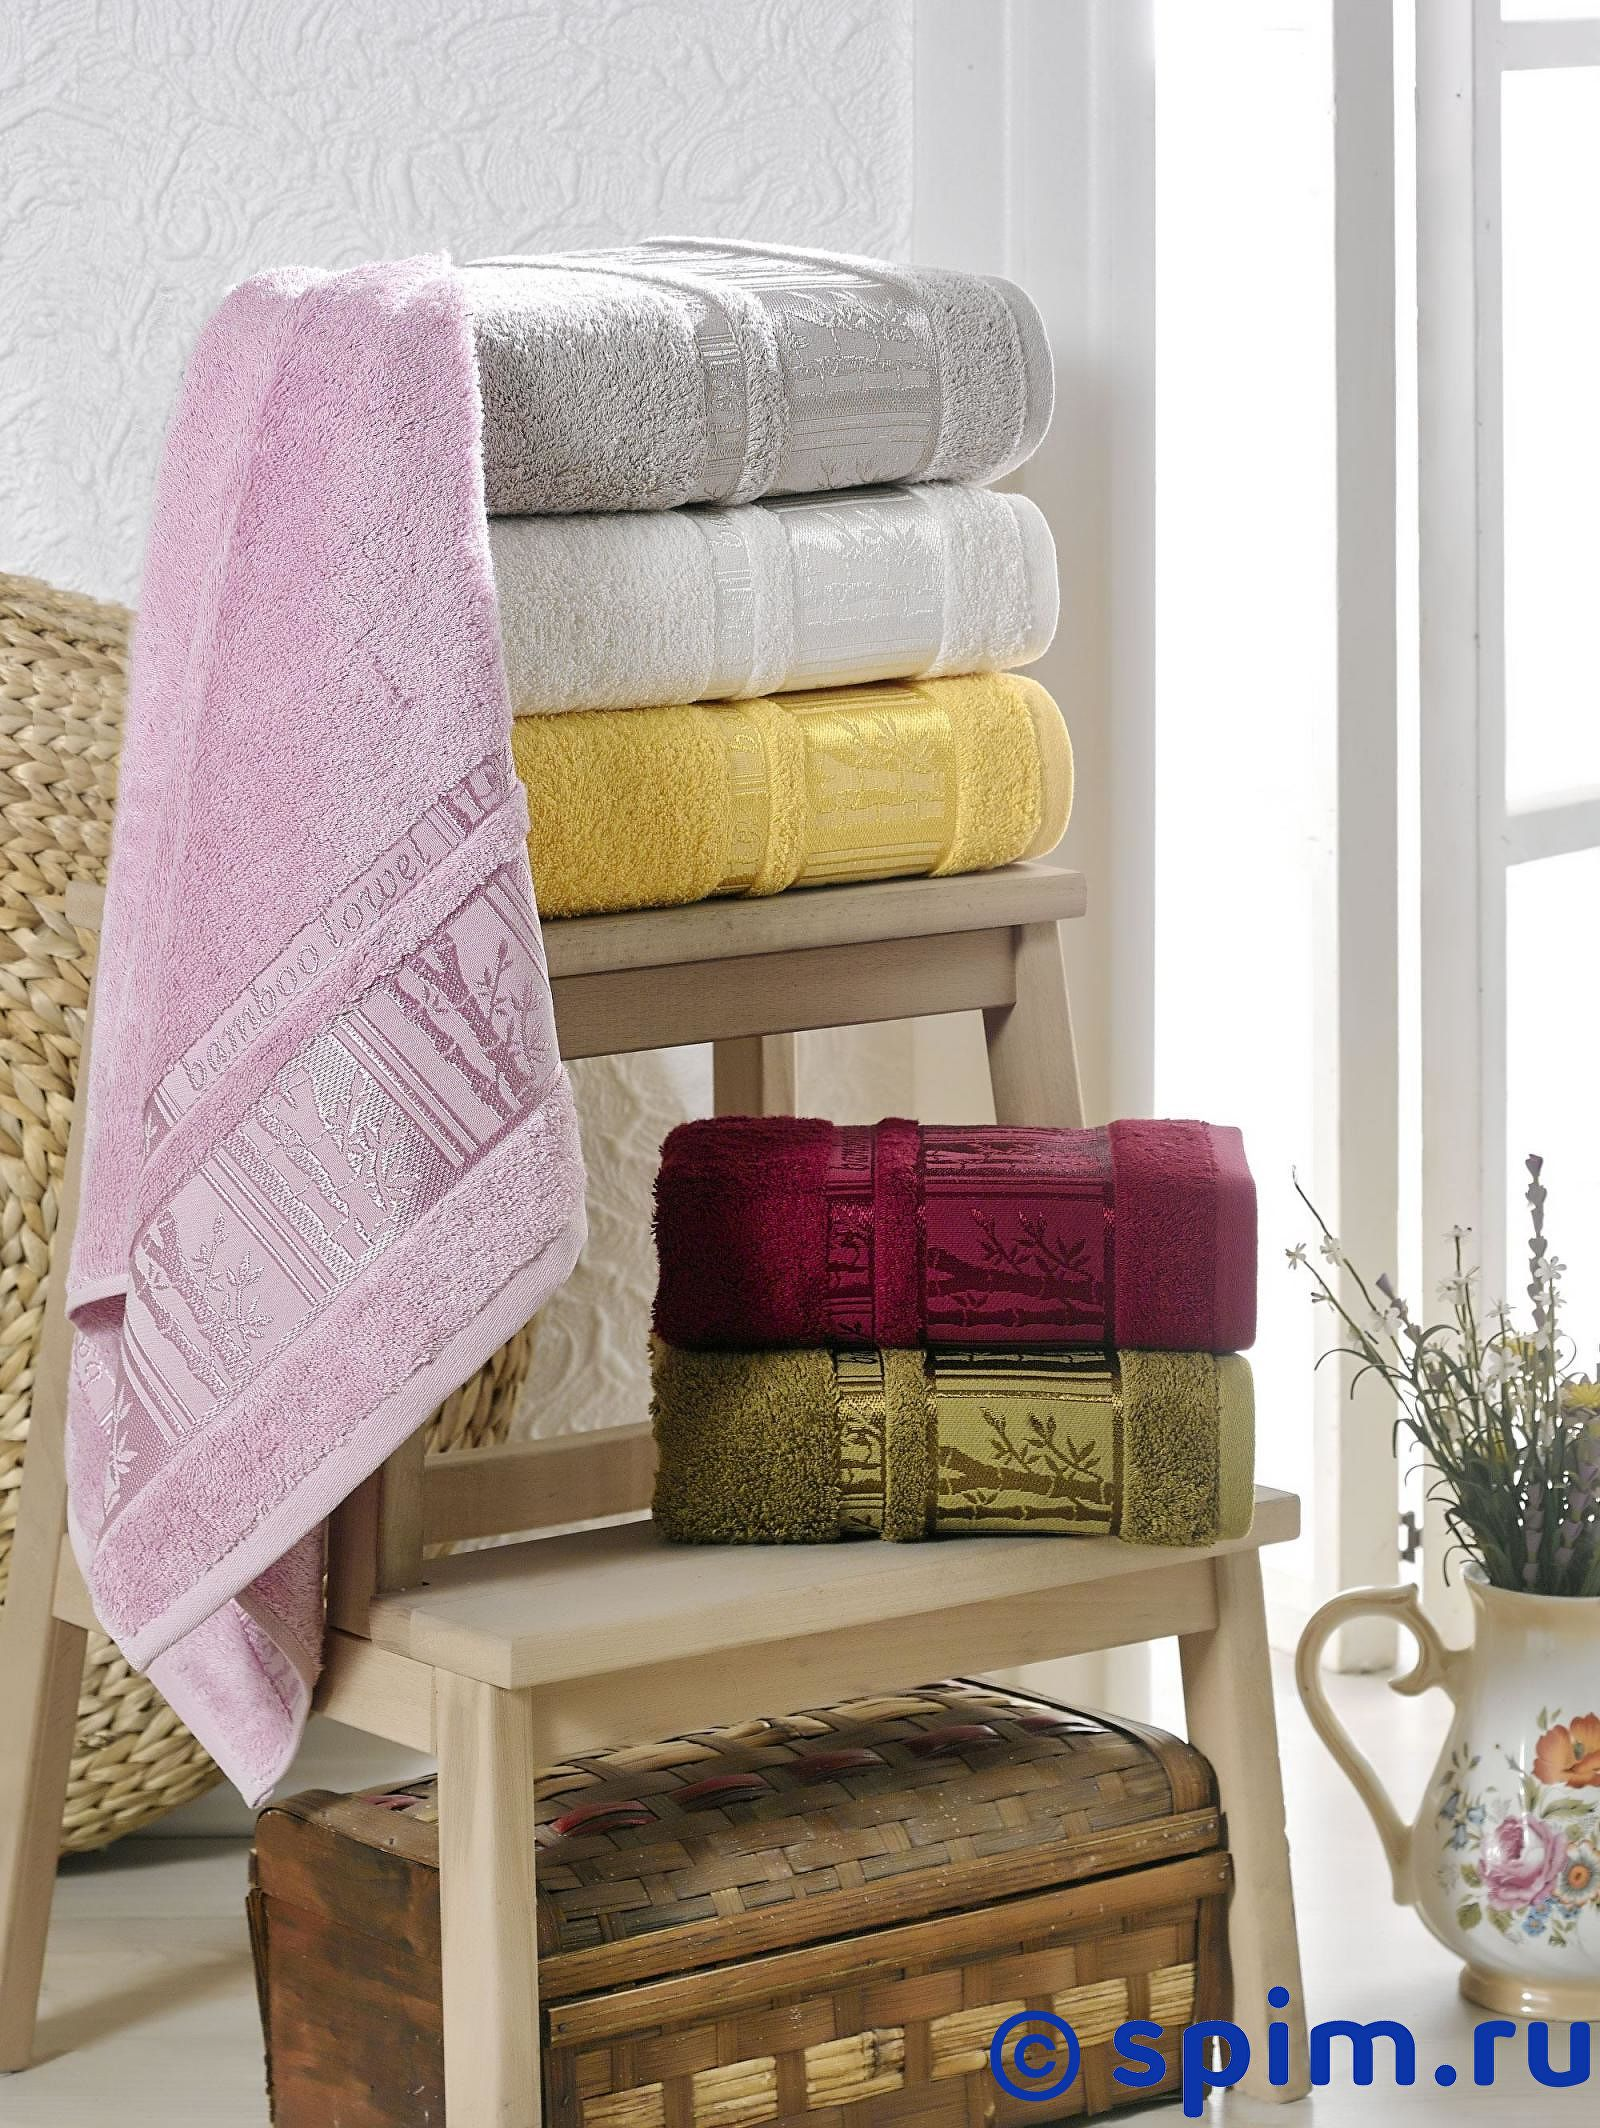 Набор из 6-ти полотенец Philippus Slow Towel 50х90 см 50х90 см полотенца philippus полотенце towel 50х90 см 6 шт